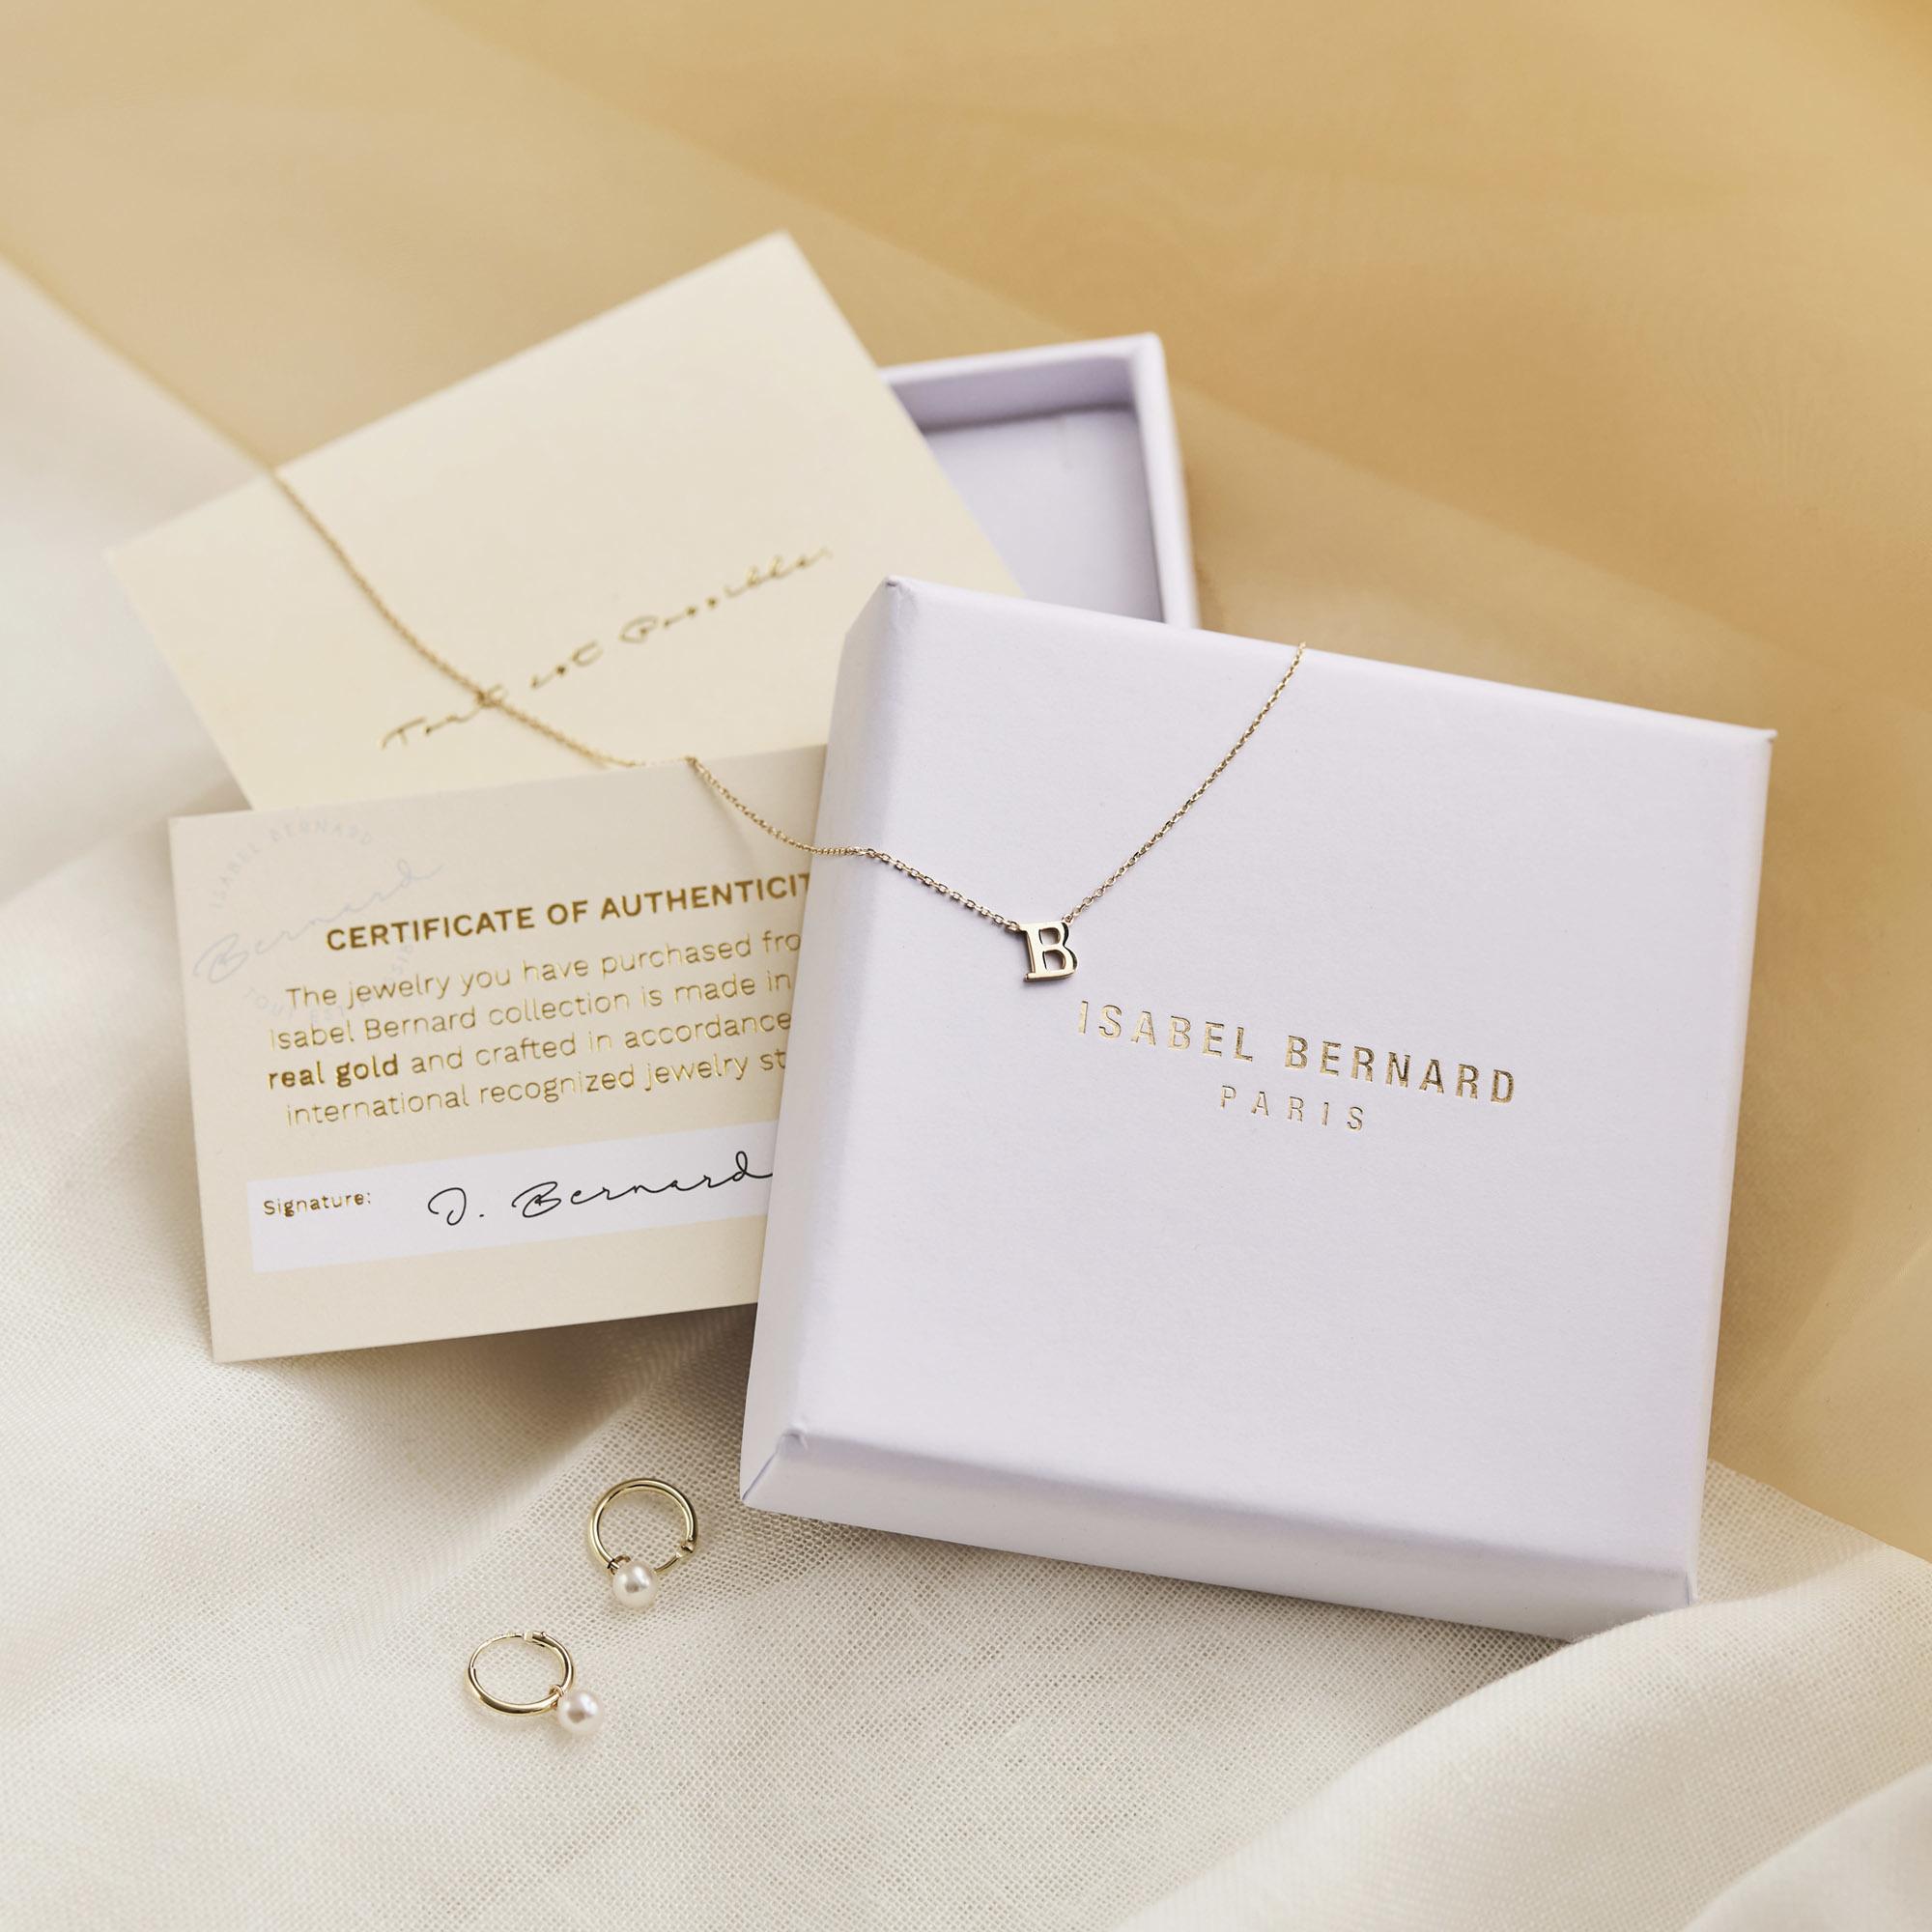 Isabel Bernard Aidee Ayla 14 karat gold drop earrings with links